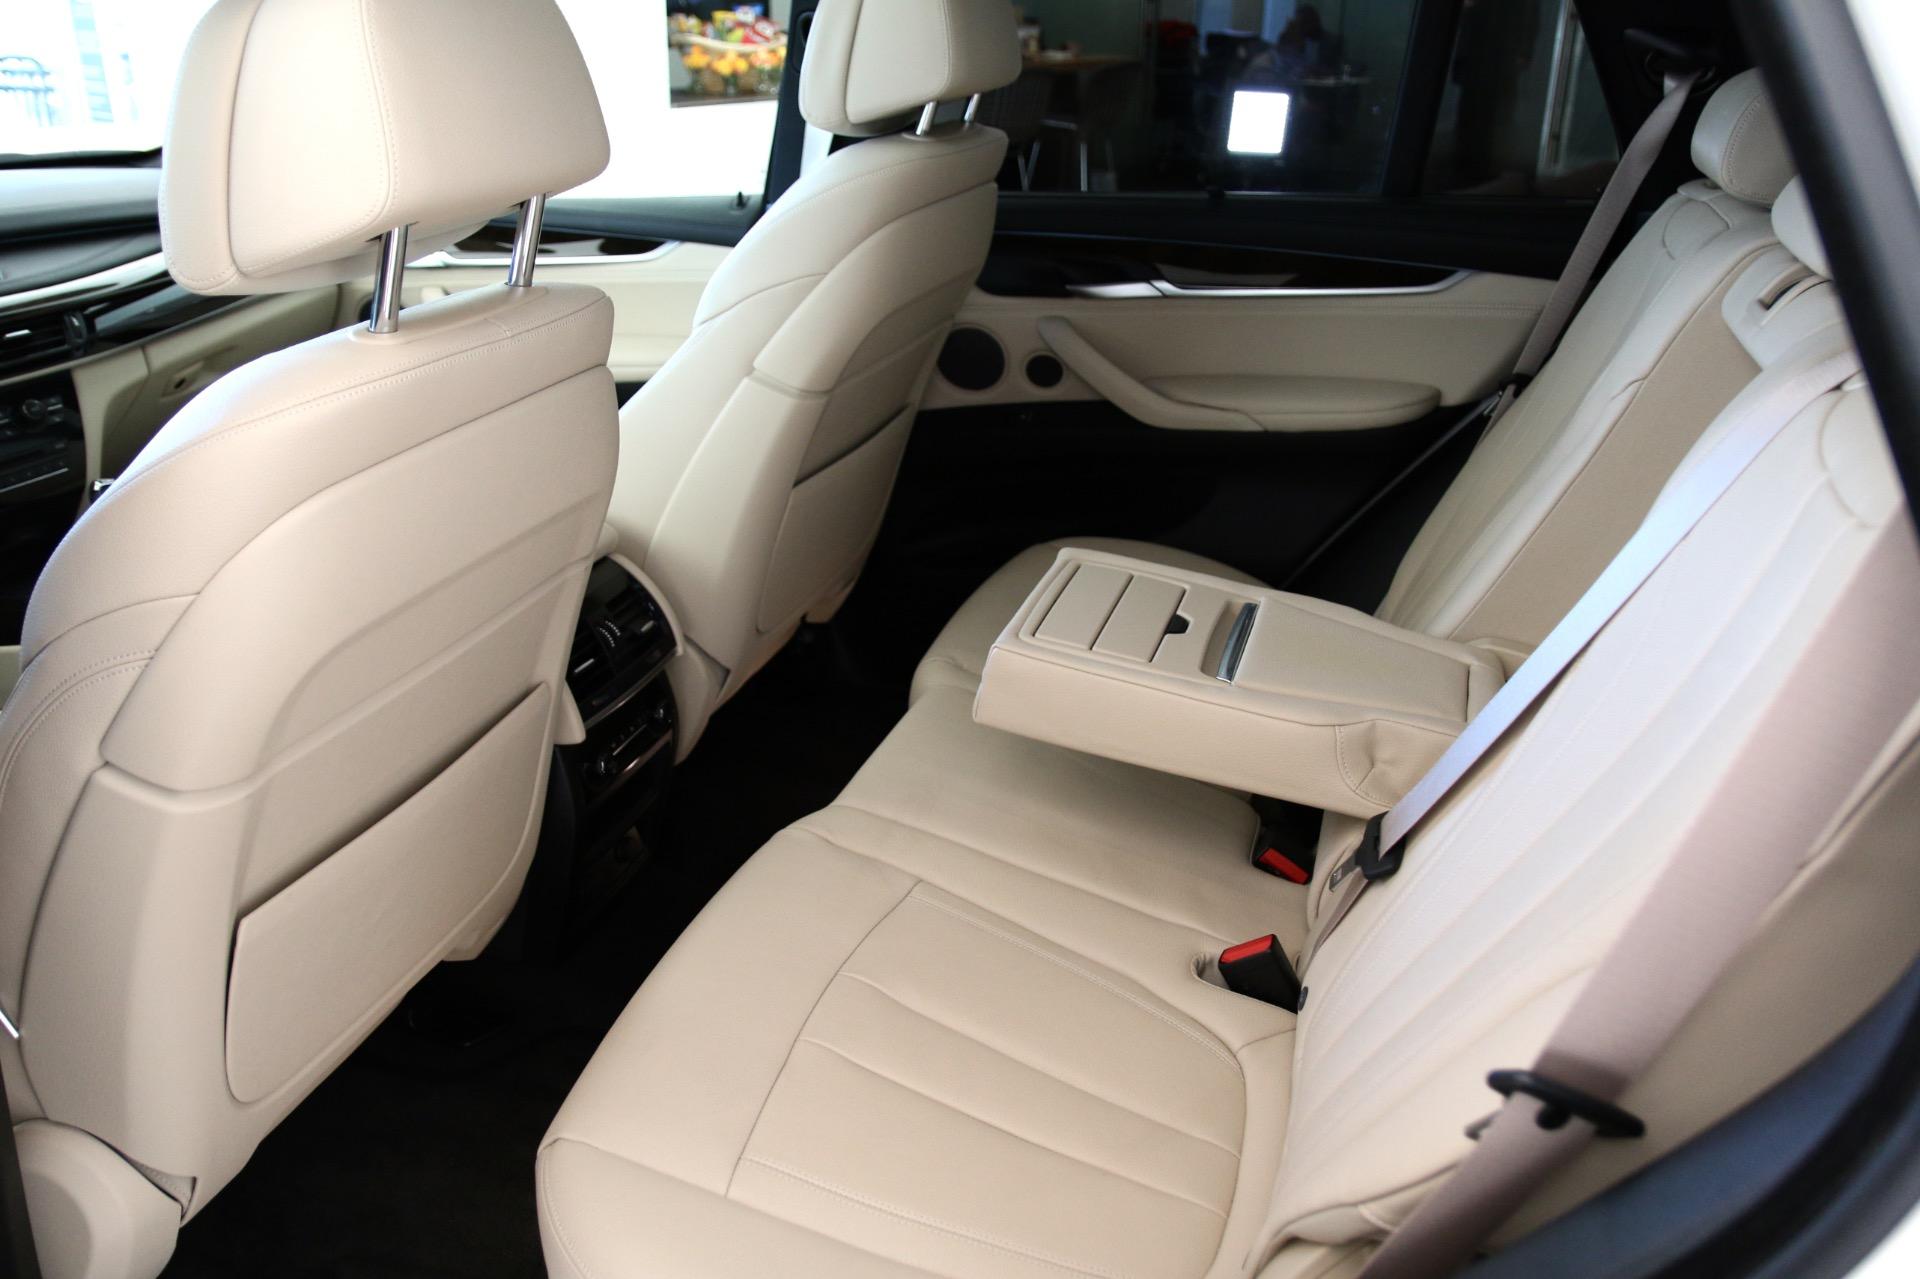 Bmw Dealer Near Me >> 2017 BMW X5 xDrive50i Stock # 8N019042A for sale near Vienna, VA   VA BMW Dealer